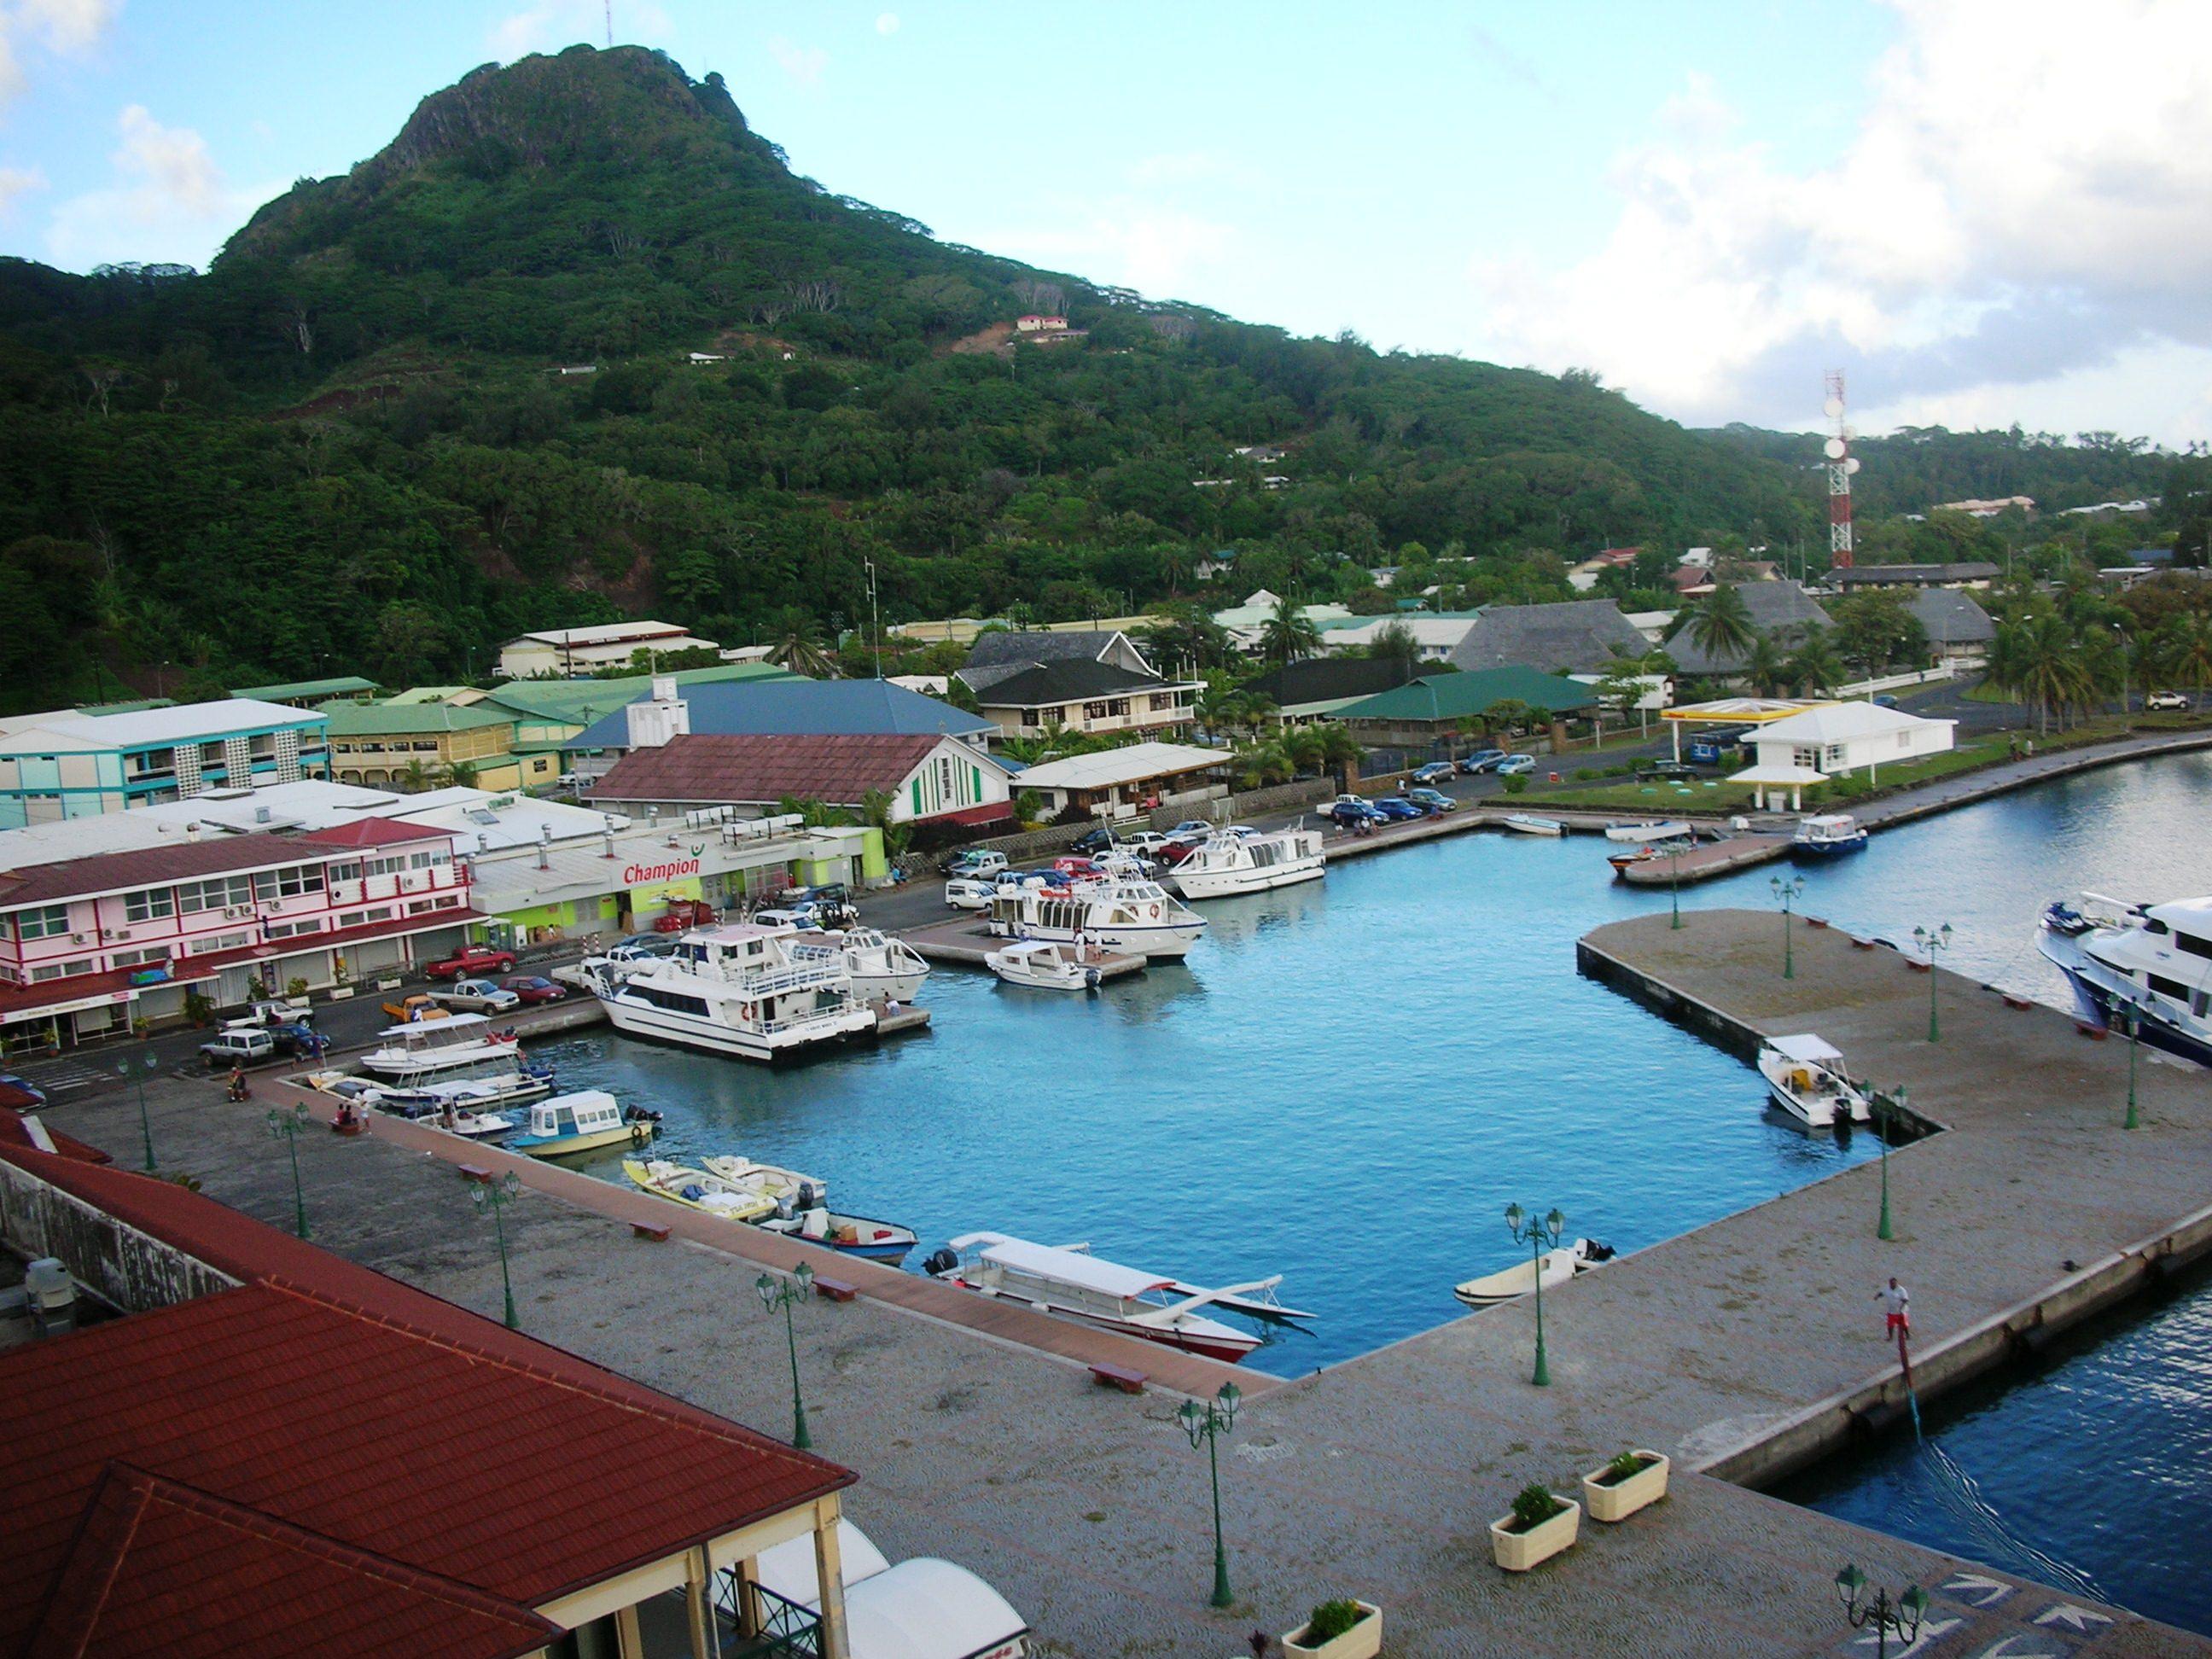 Noleggio Barche Uturoa - Navalia | Noleggia un Sogno